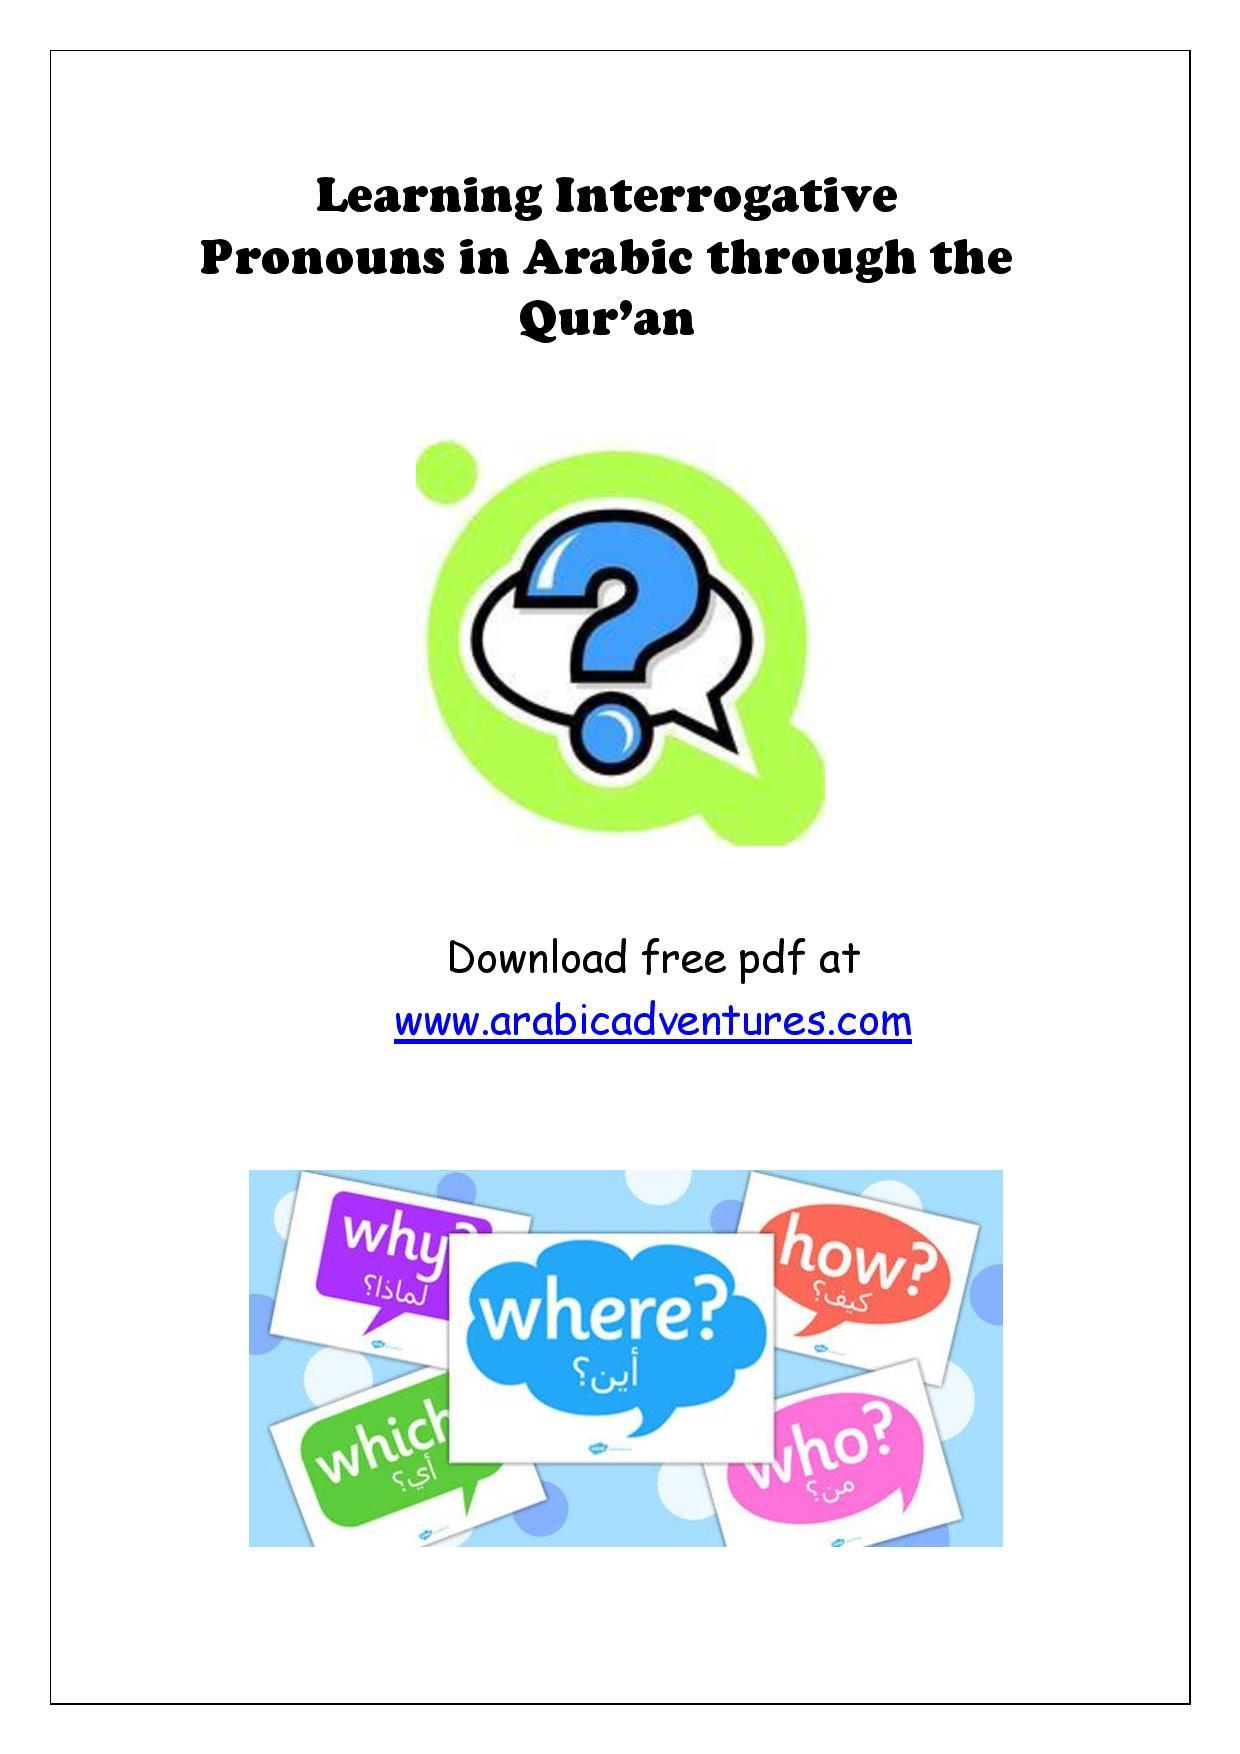 Interrogative pronouns in the Qur'an | Arabic Adventures